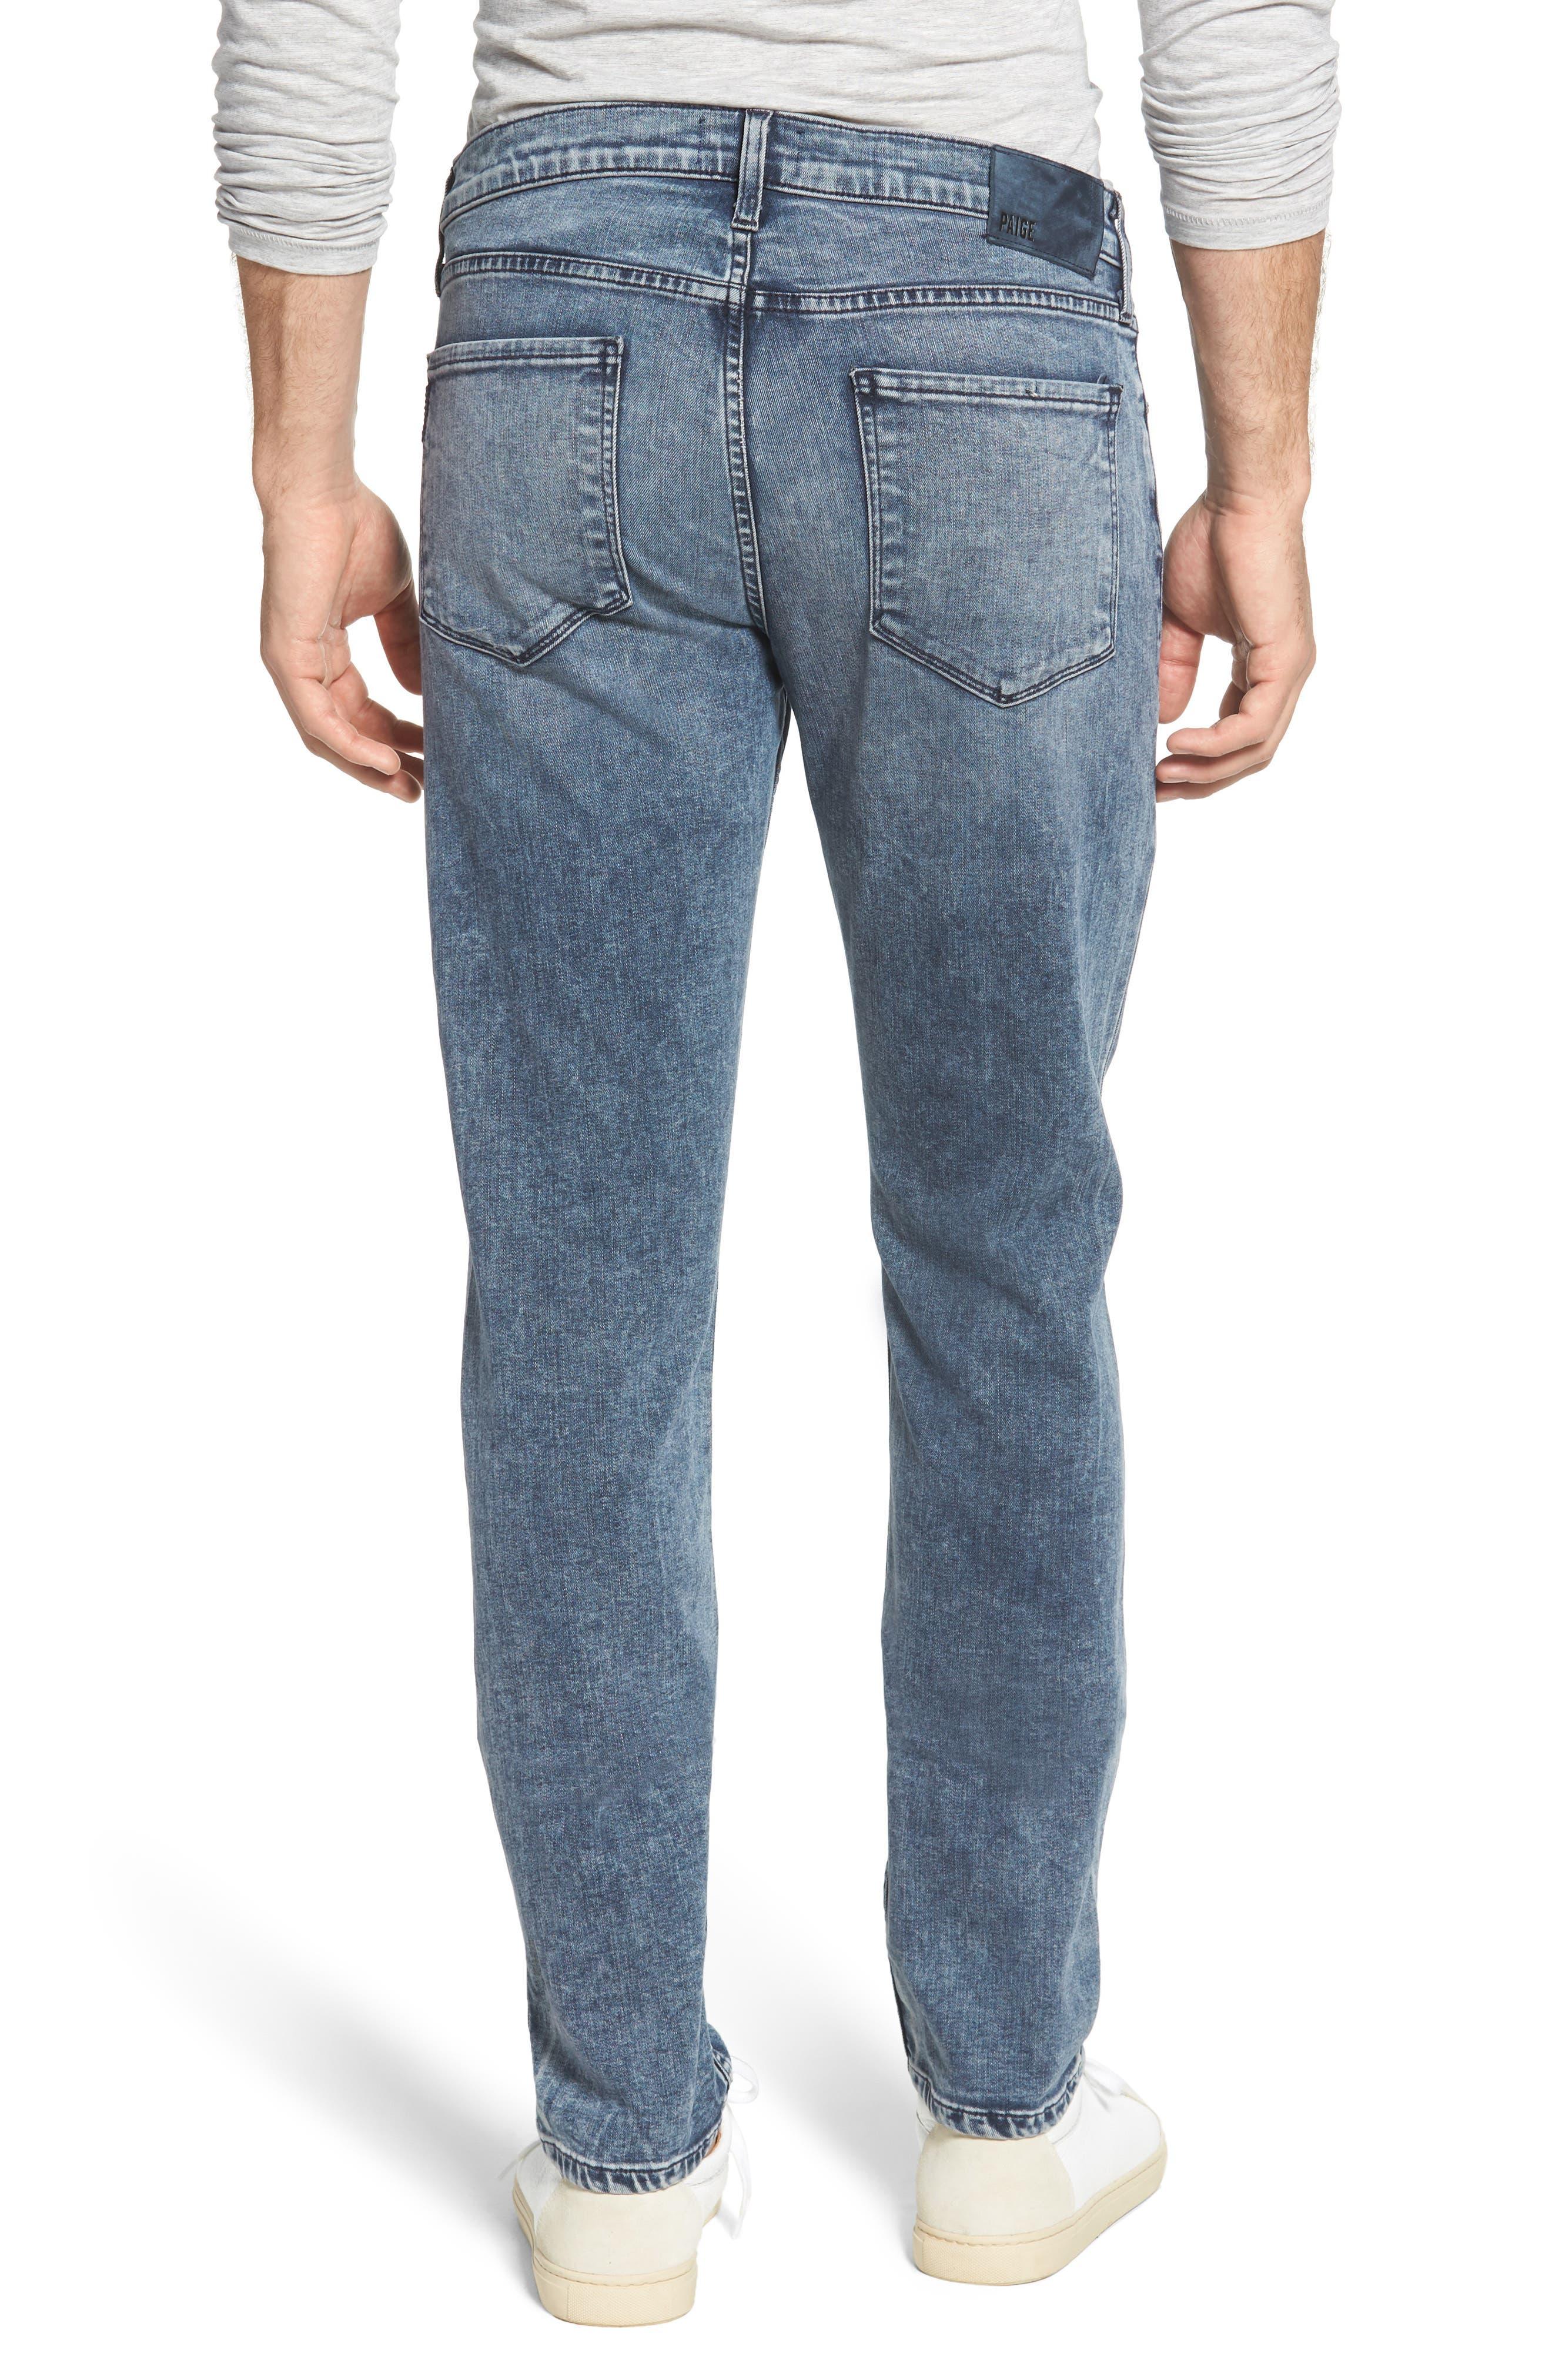 Transcend - Lennox Slim Fit Jeans,                             Alternate thumbnail 2, color,                             Higgs